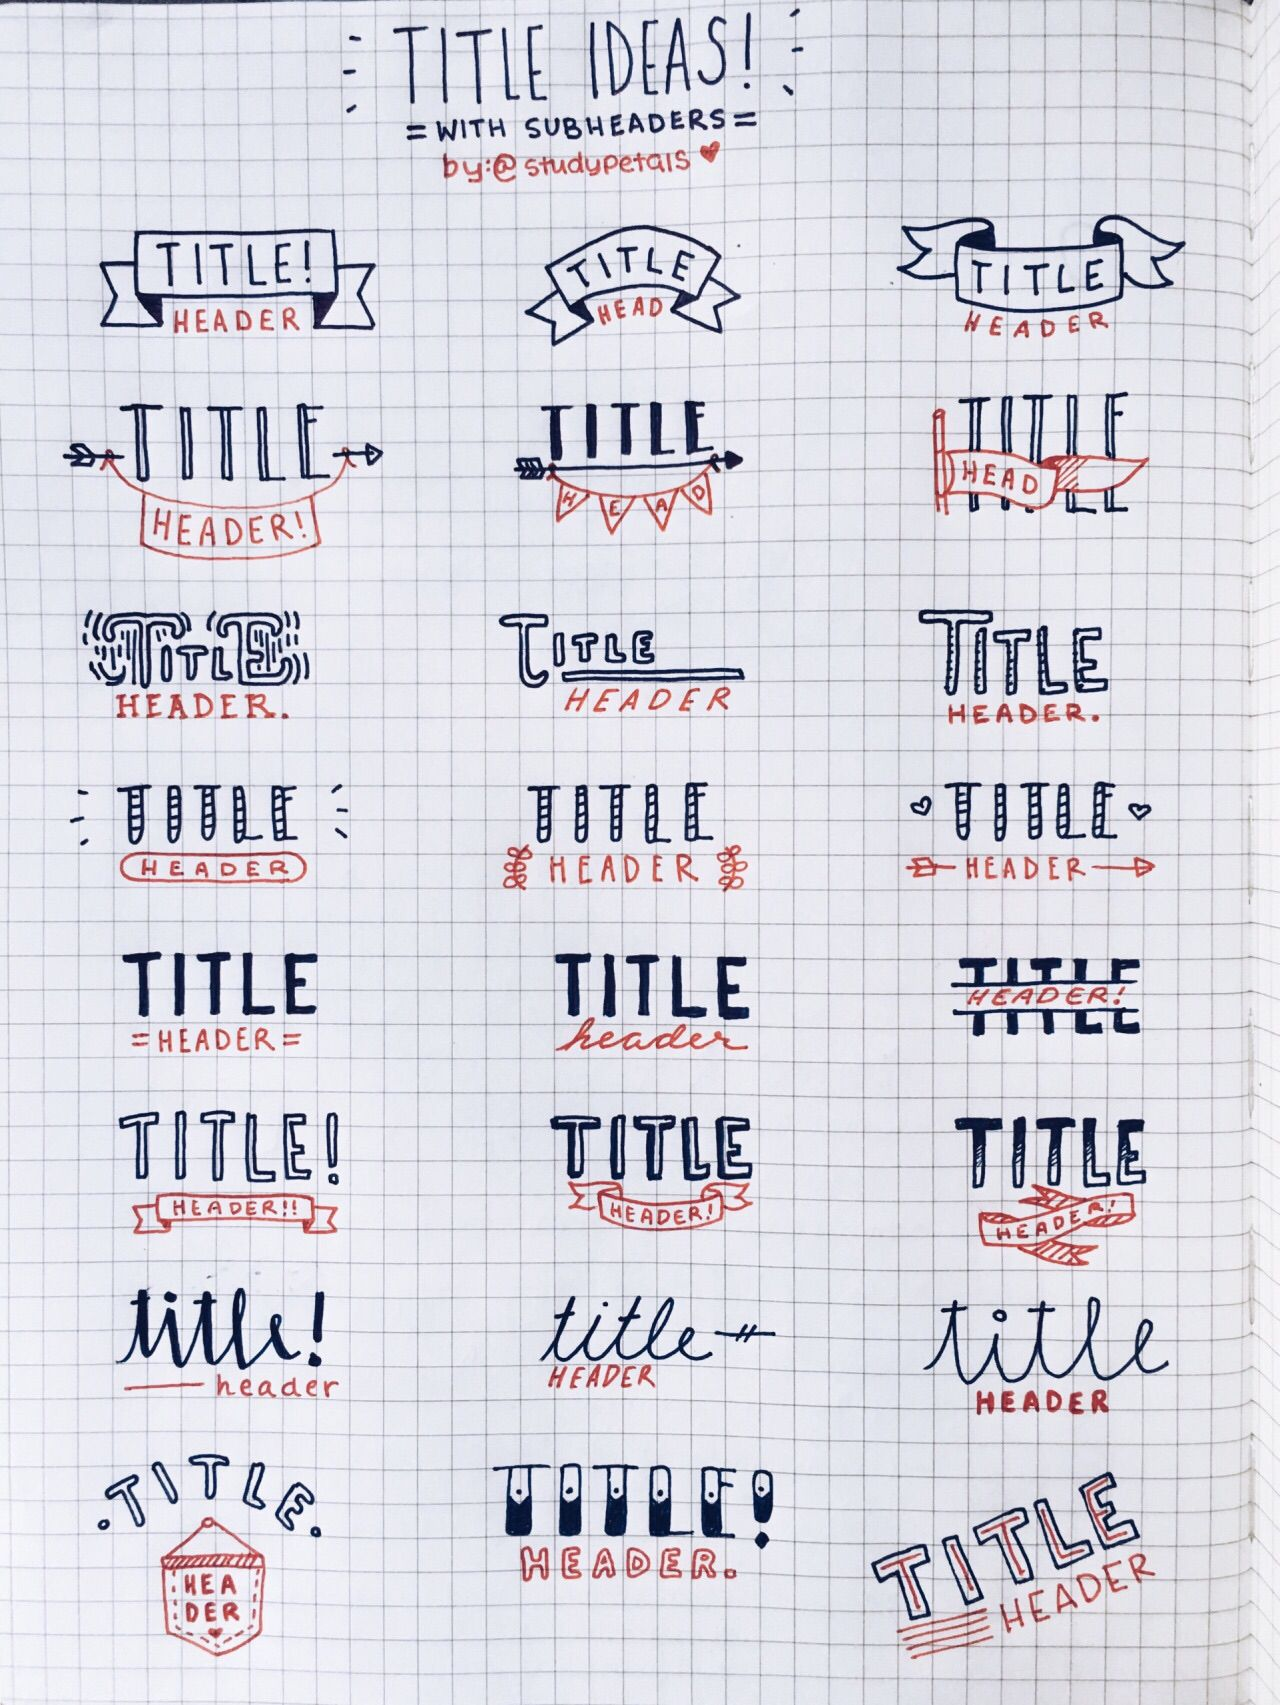 found on studypetals tumblr | bullet journaling | pinterest | bullet